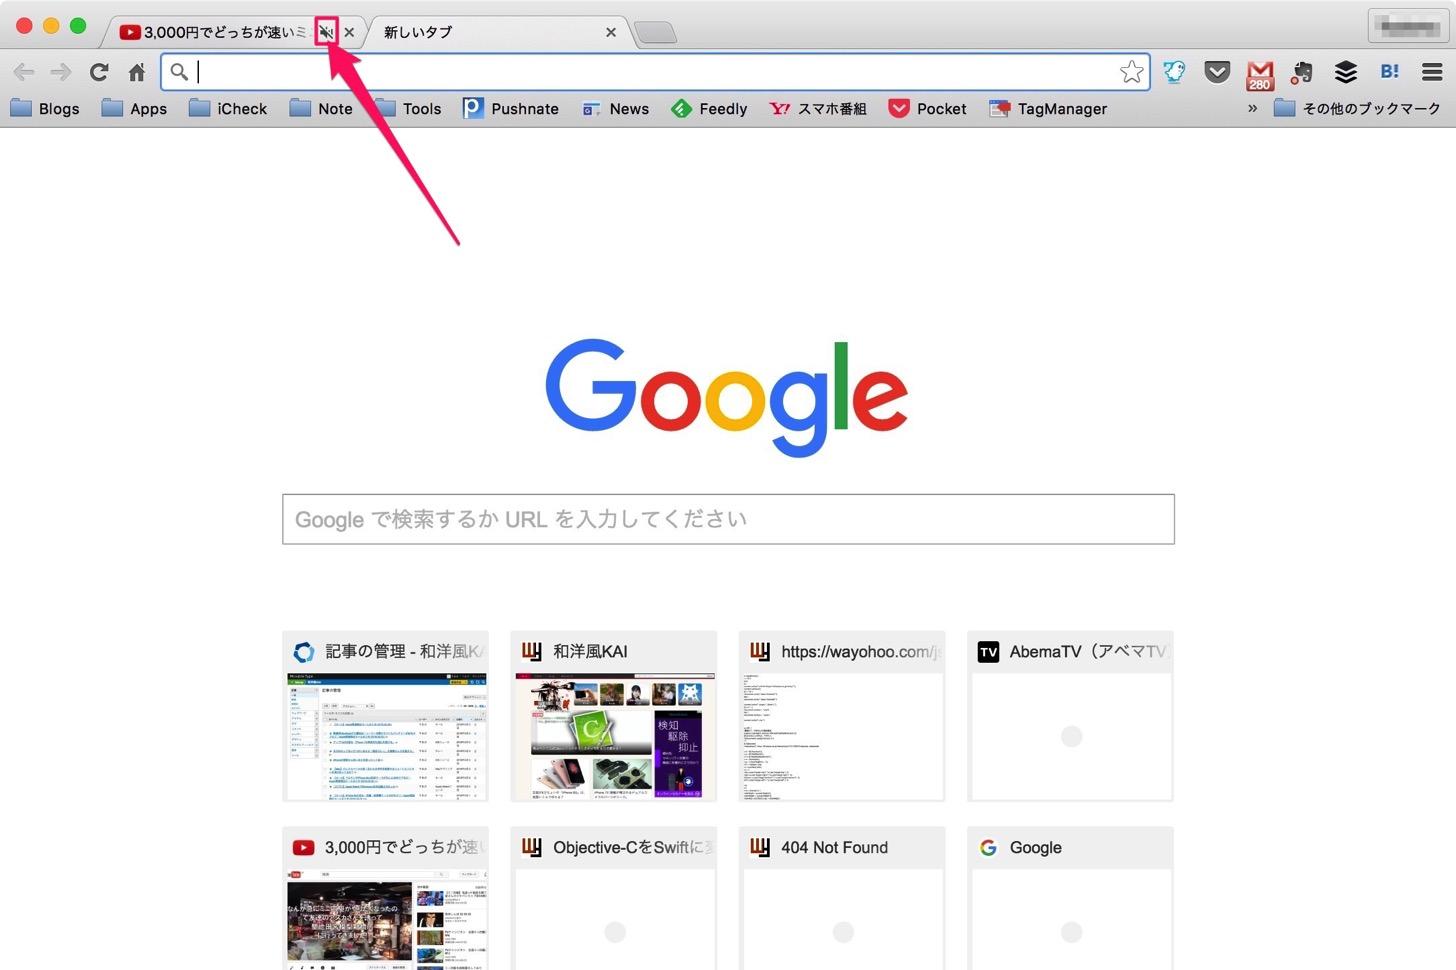 Chromeで別のタブから動画の音量をミュートにする方法。